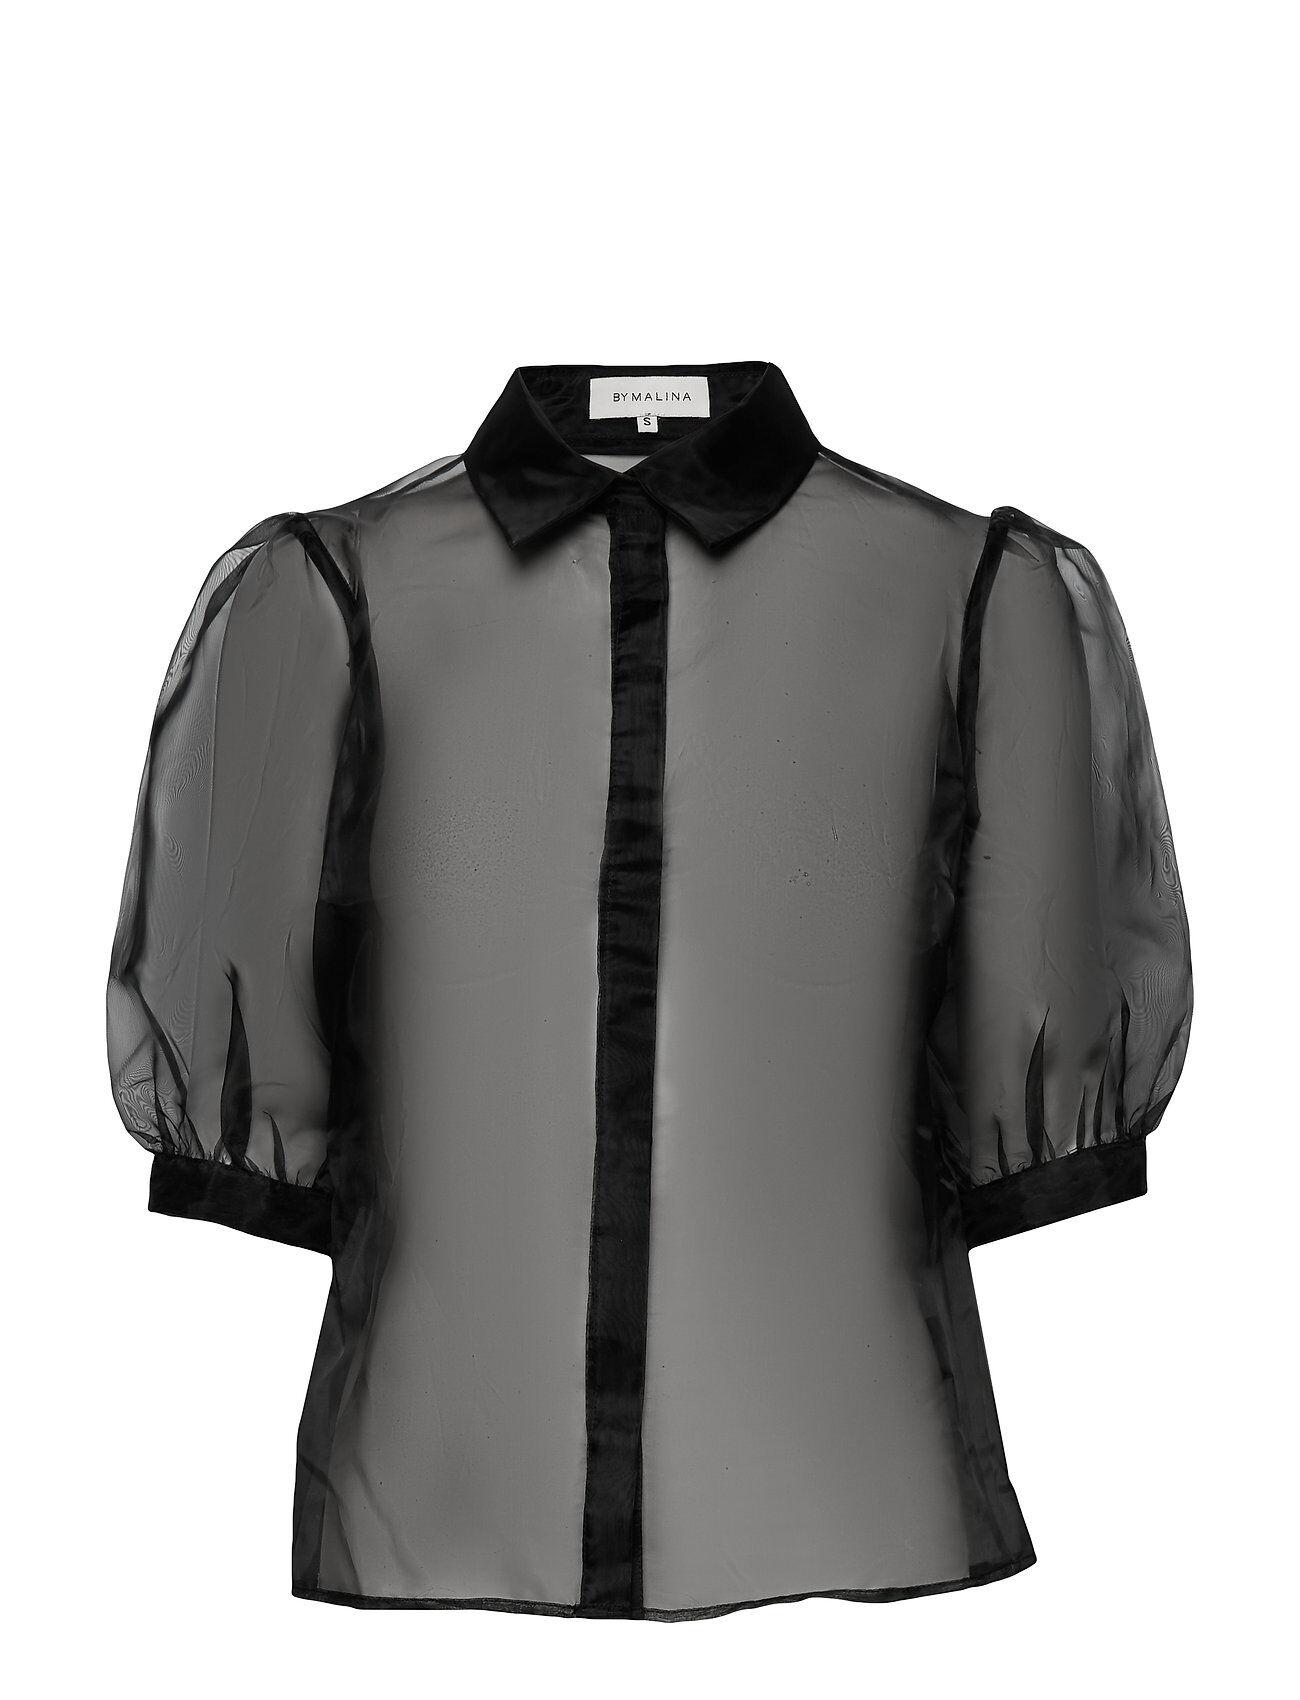 By Malina Neva Blouse Blouses Short-sleeved Musta By Malina